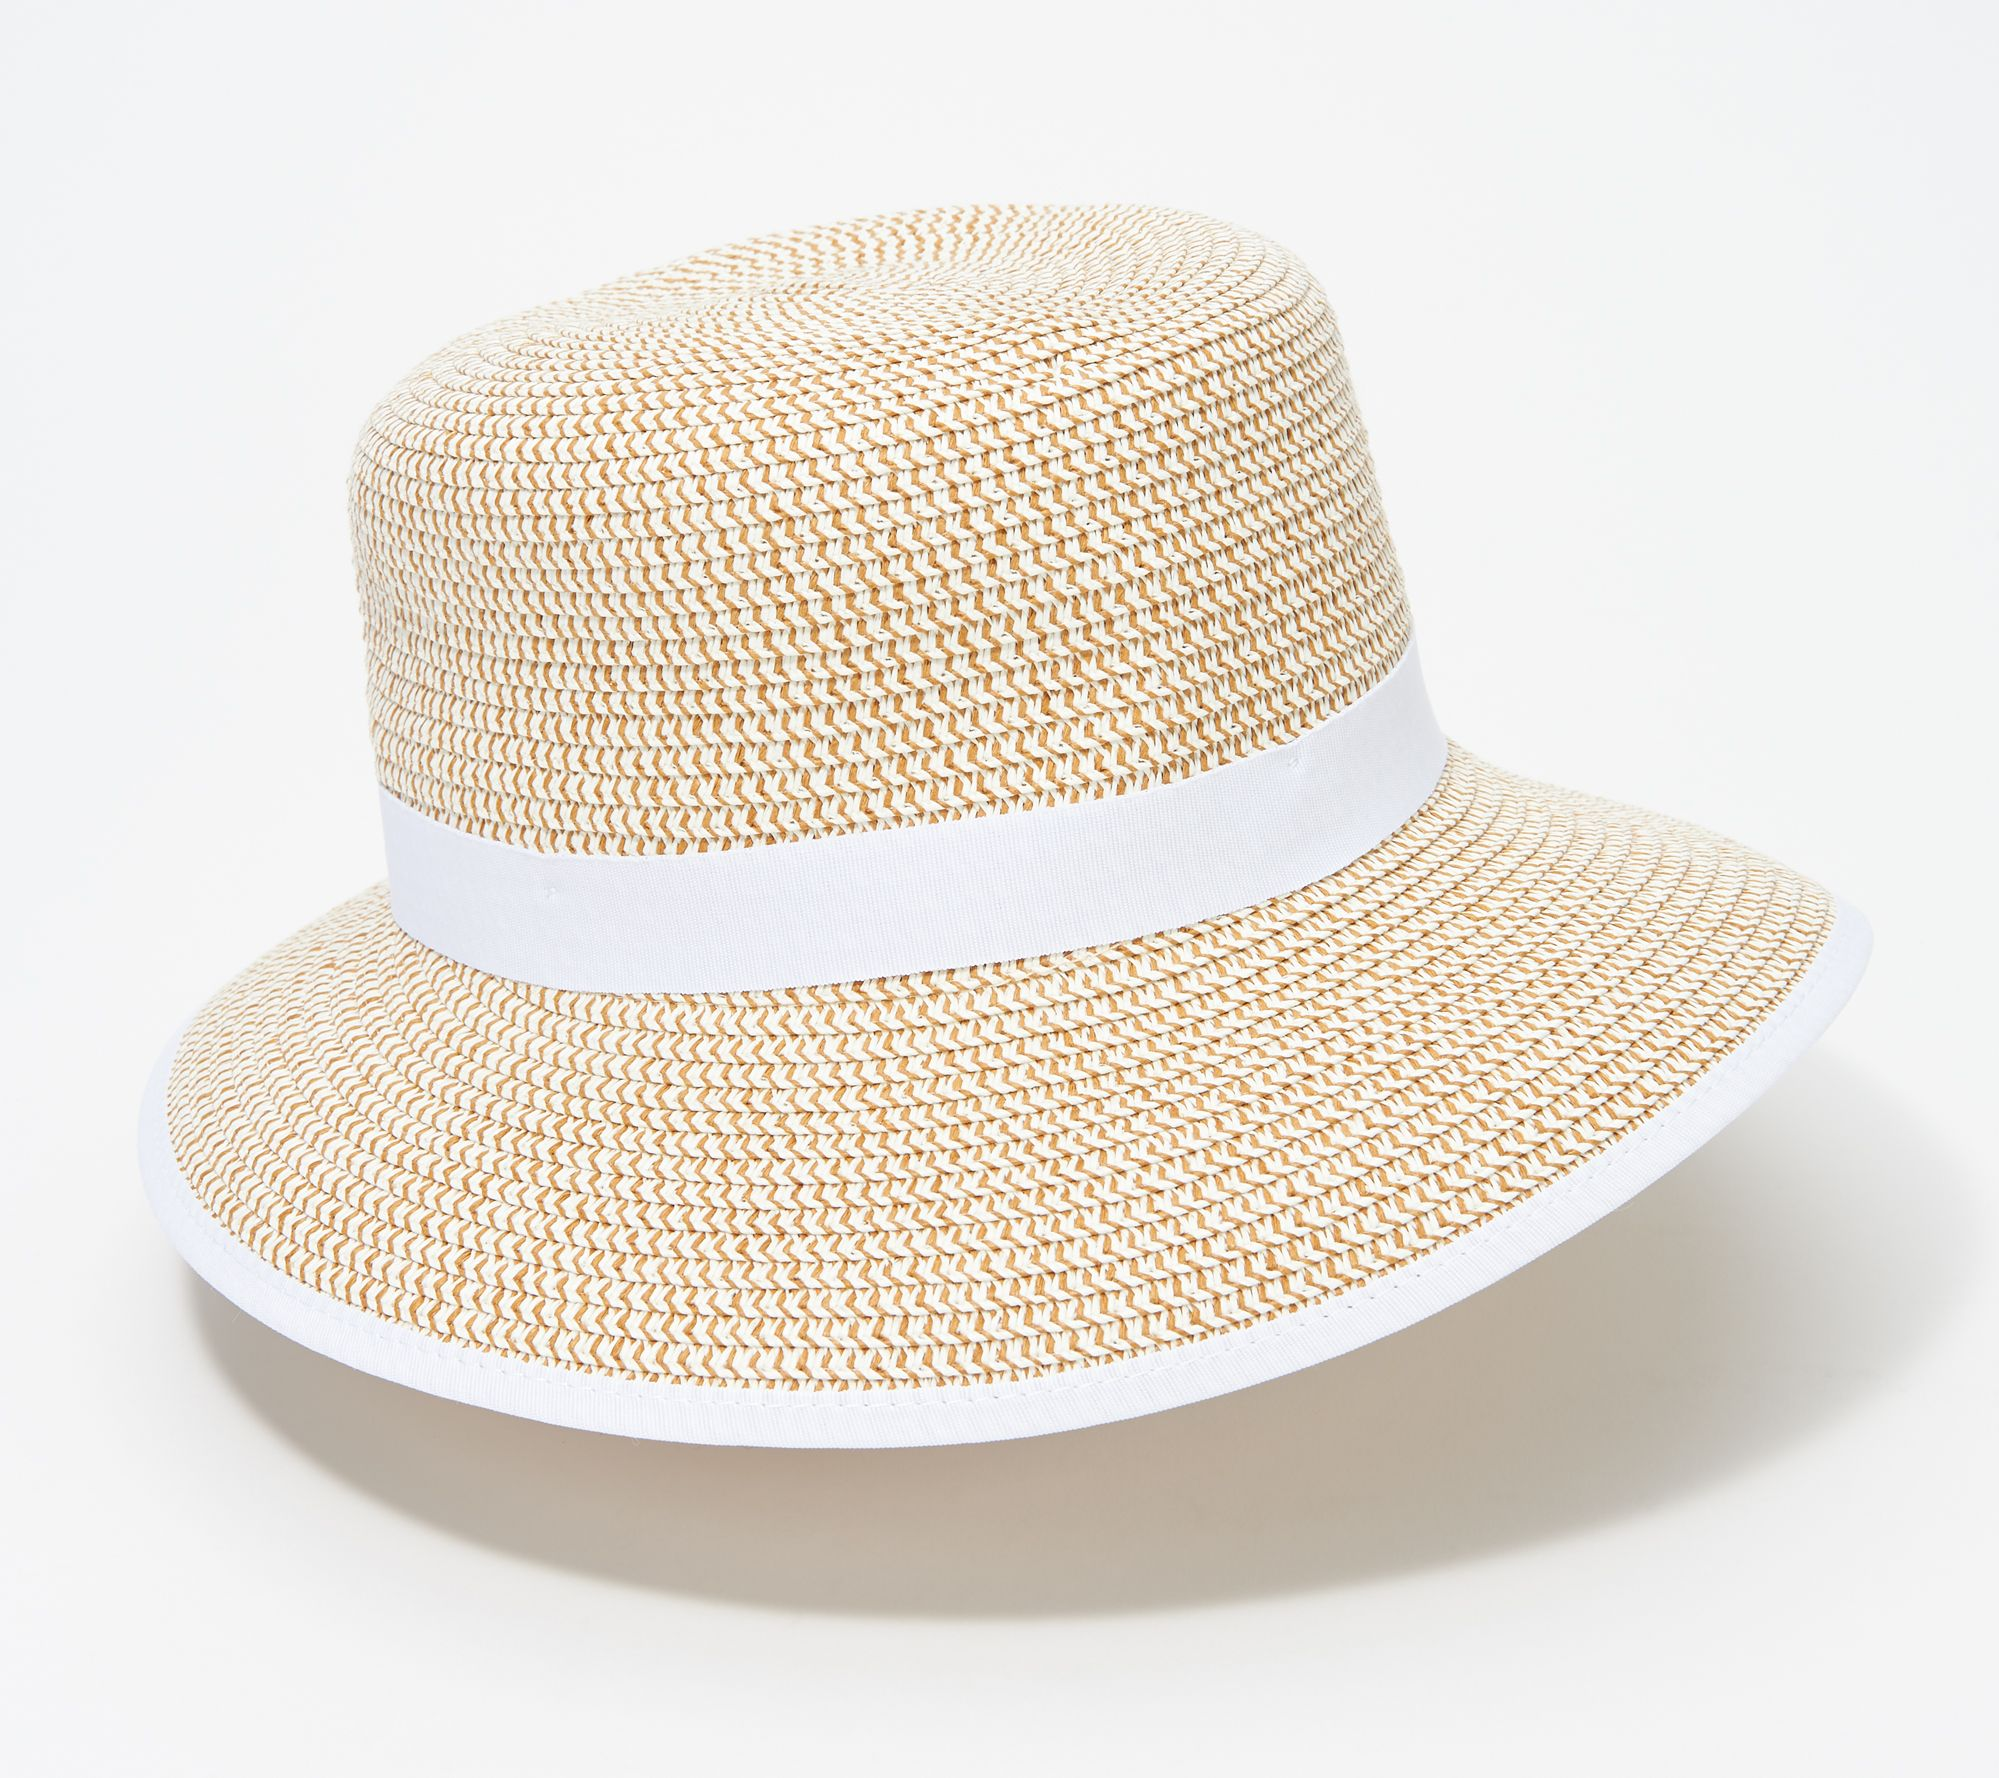 54184b73e Physicians Endorsed UPF 50+ Sunchaser Adjustable Hat — QVC.com